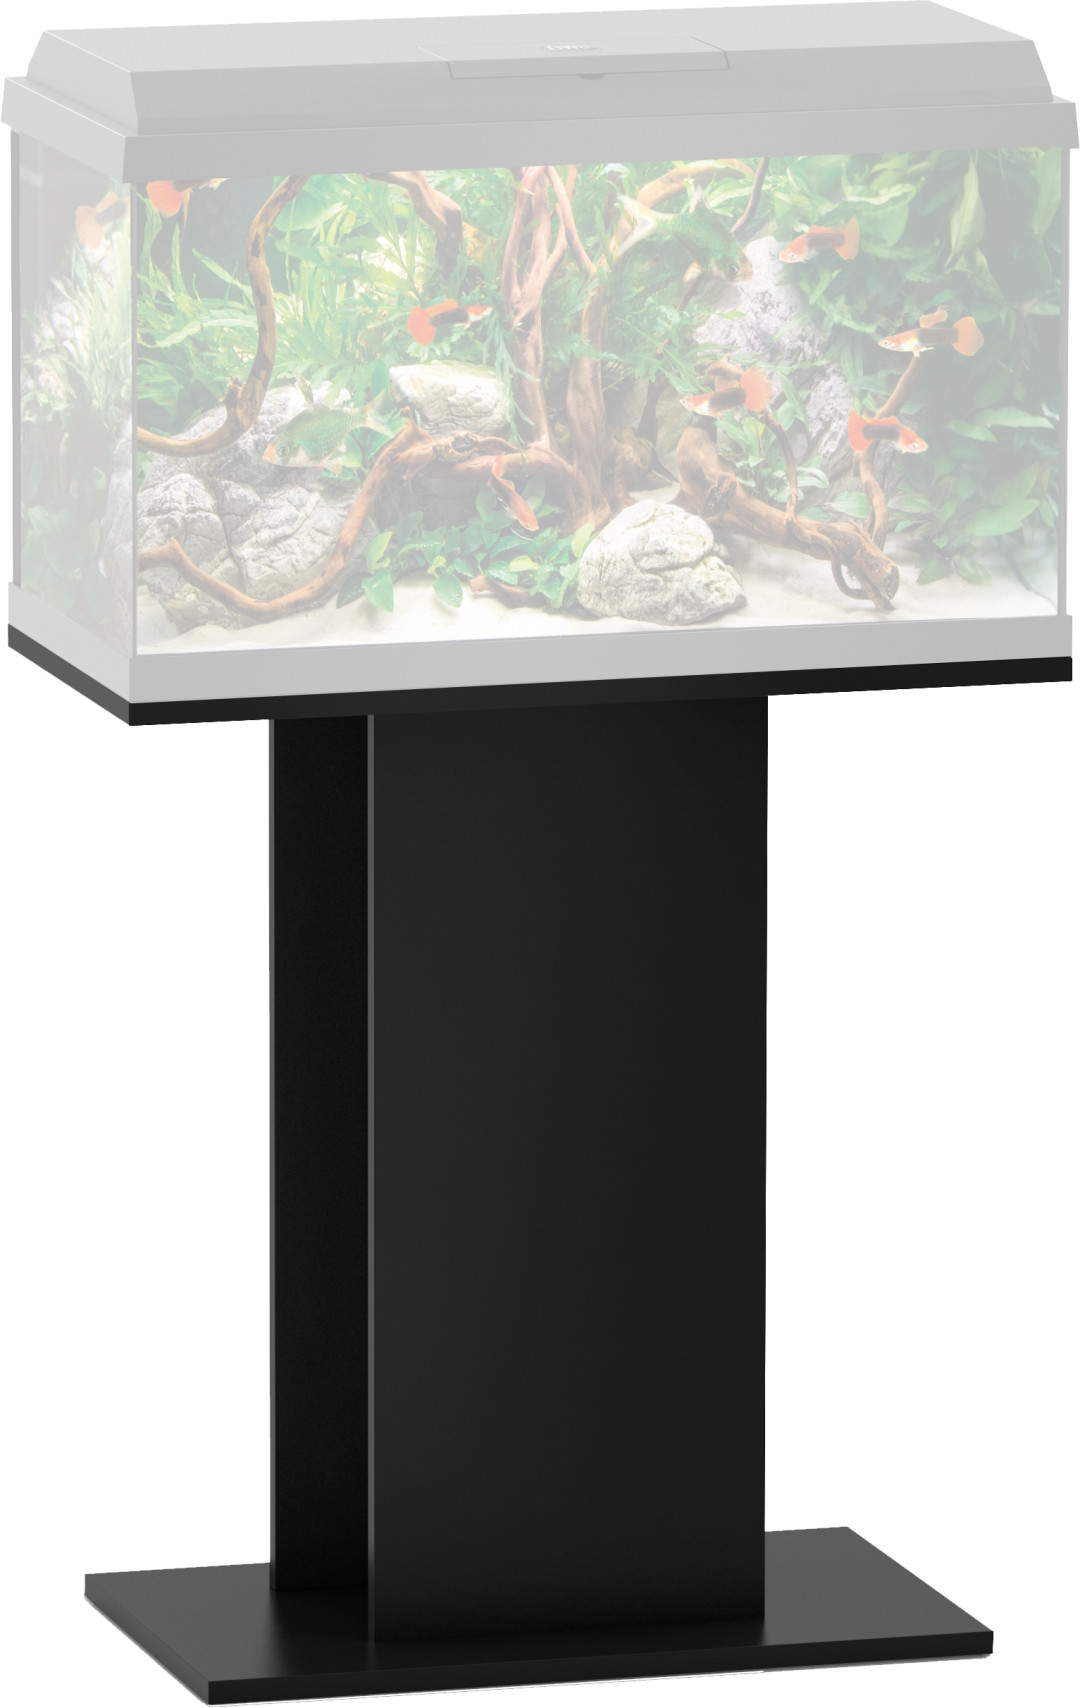 Juwel meubel SB 50/60 zwart